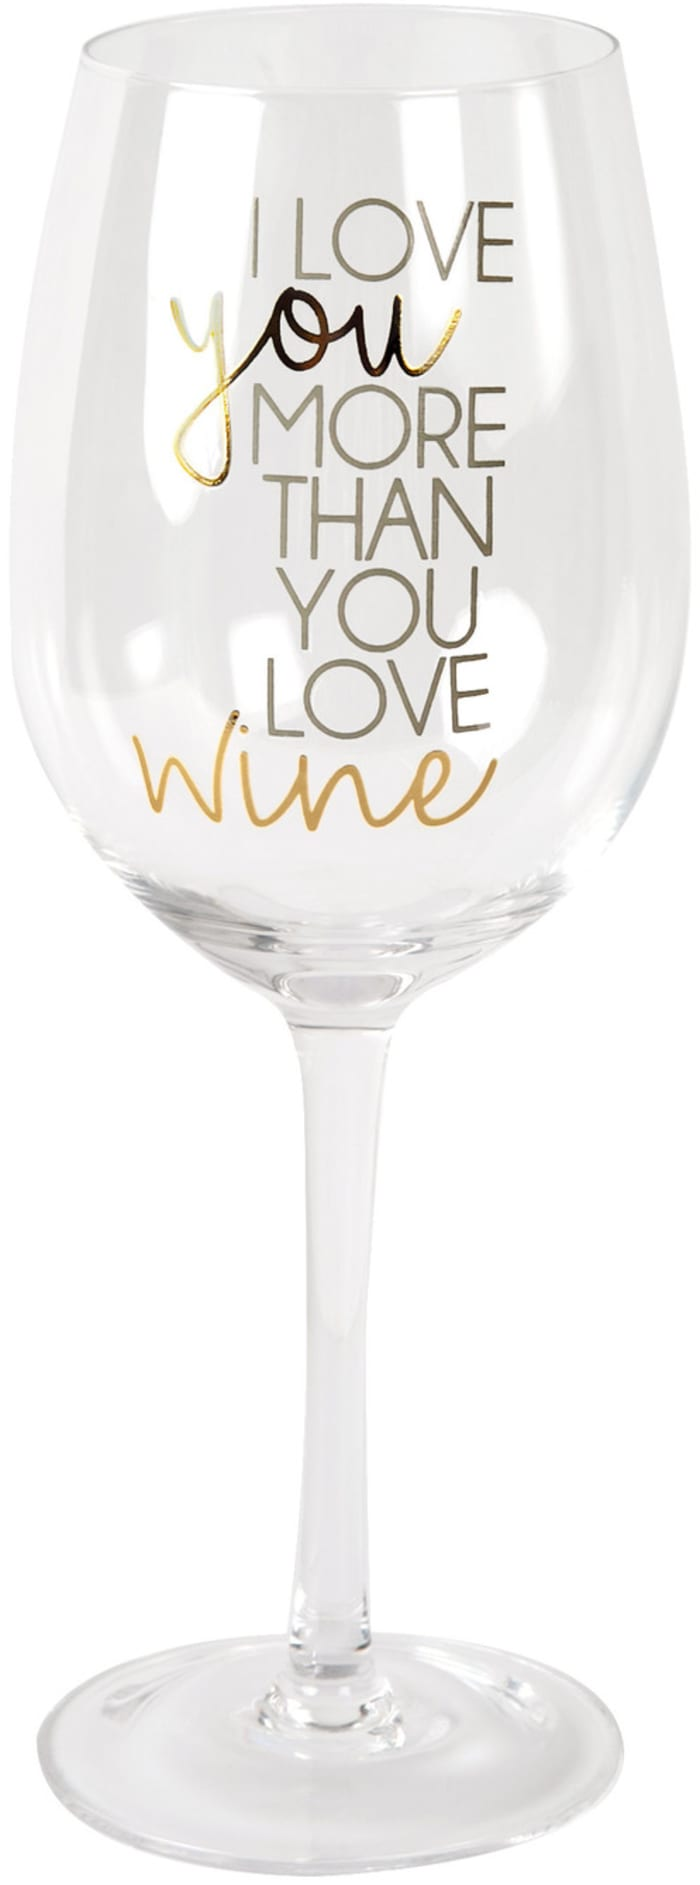 Wine - Crystal Wine Glass